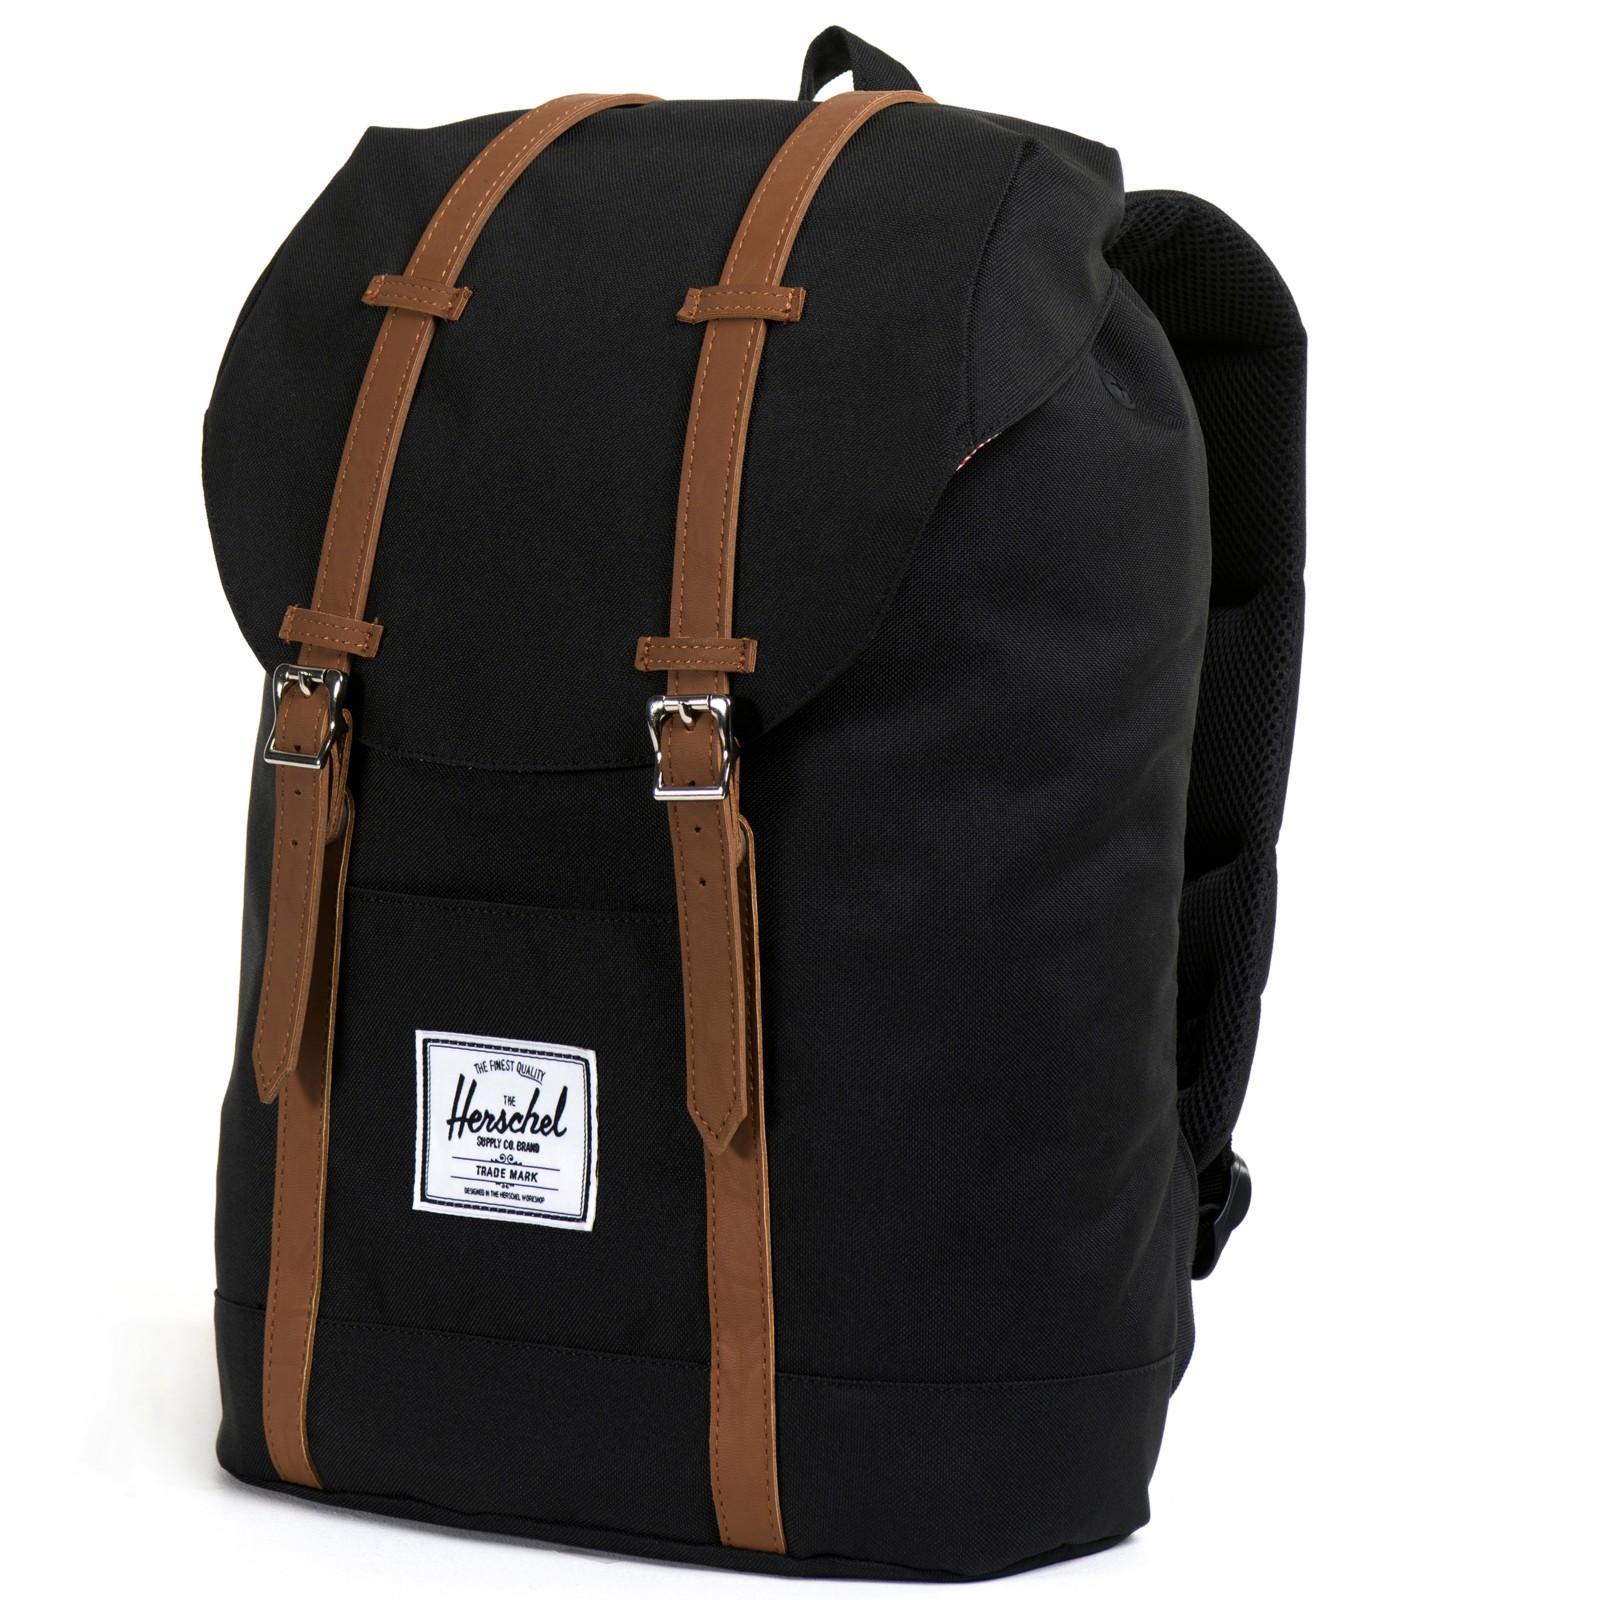 Herschel Supply Co. Synthetic Retreat Backpack in Black for Men